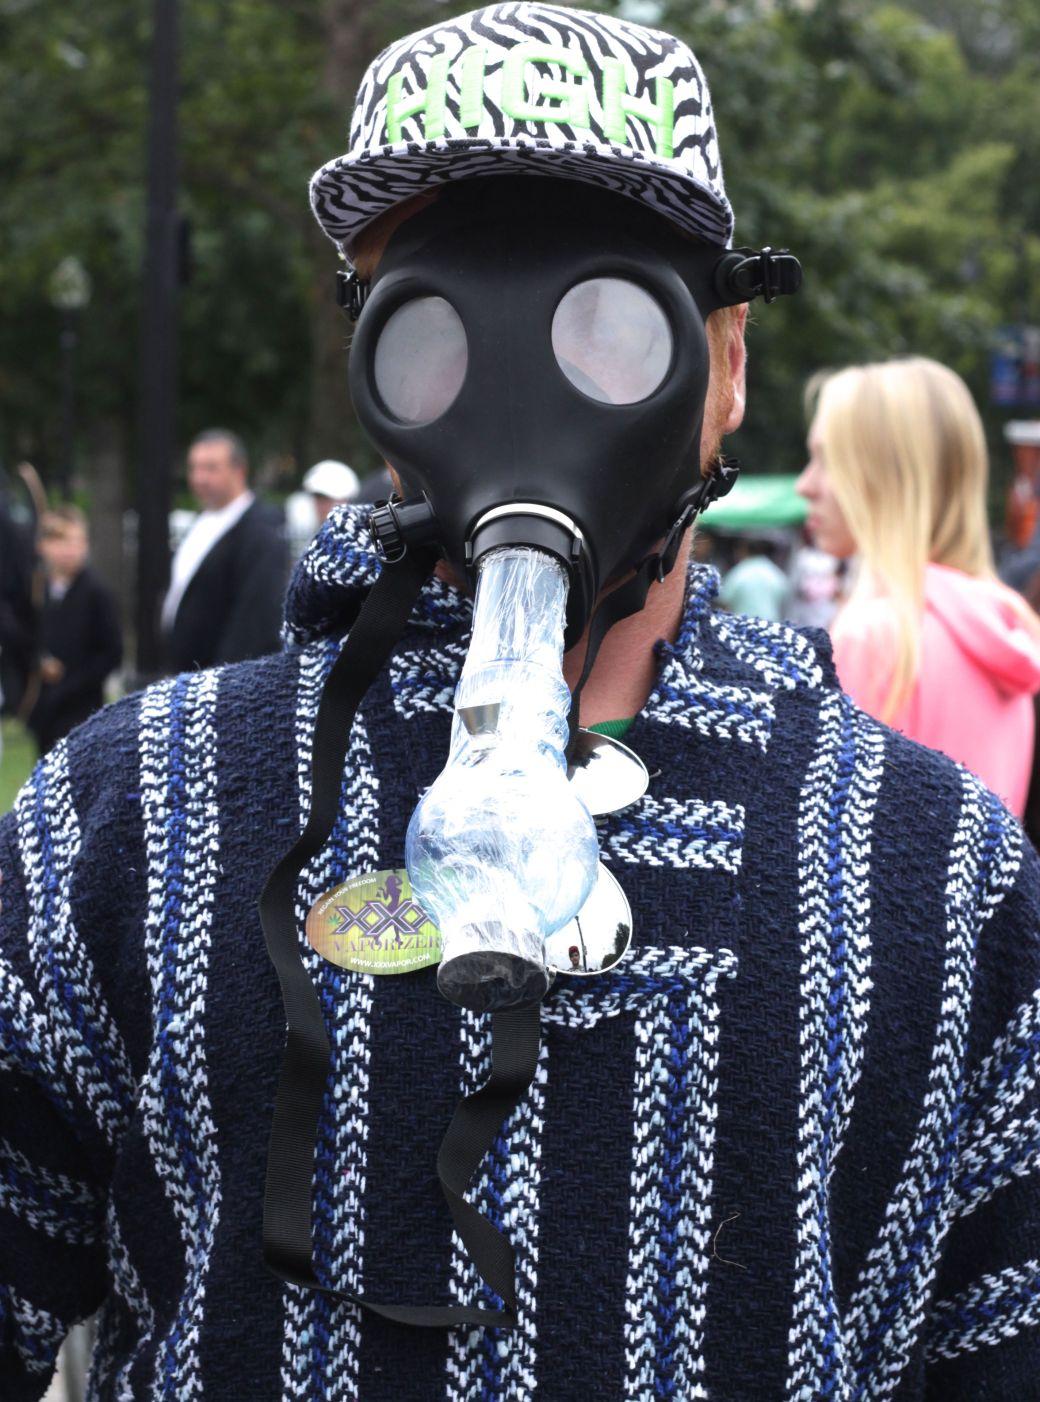 boston hemp fest 2014 park street people bong mask